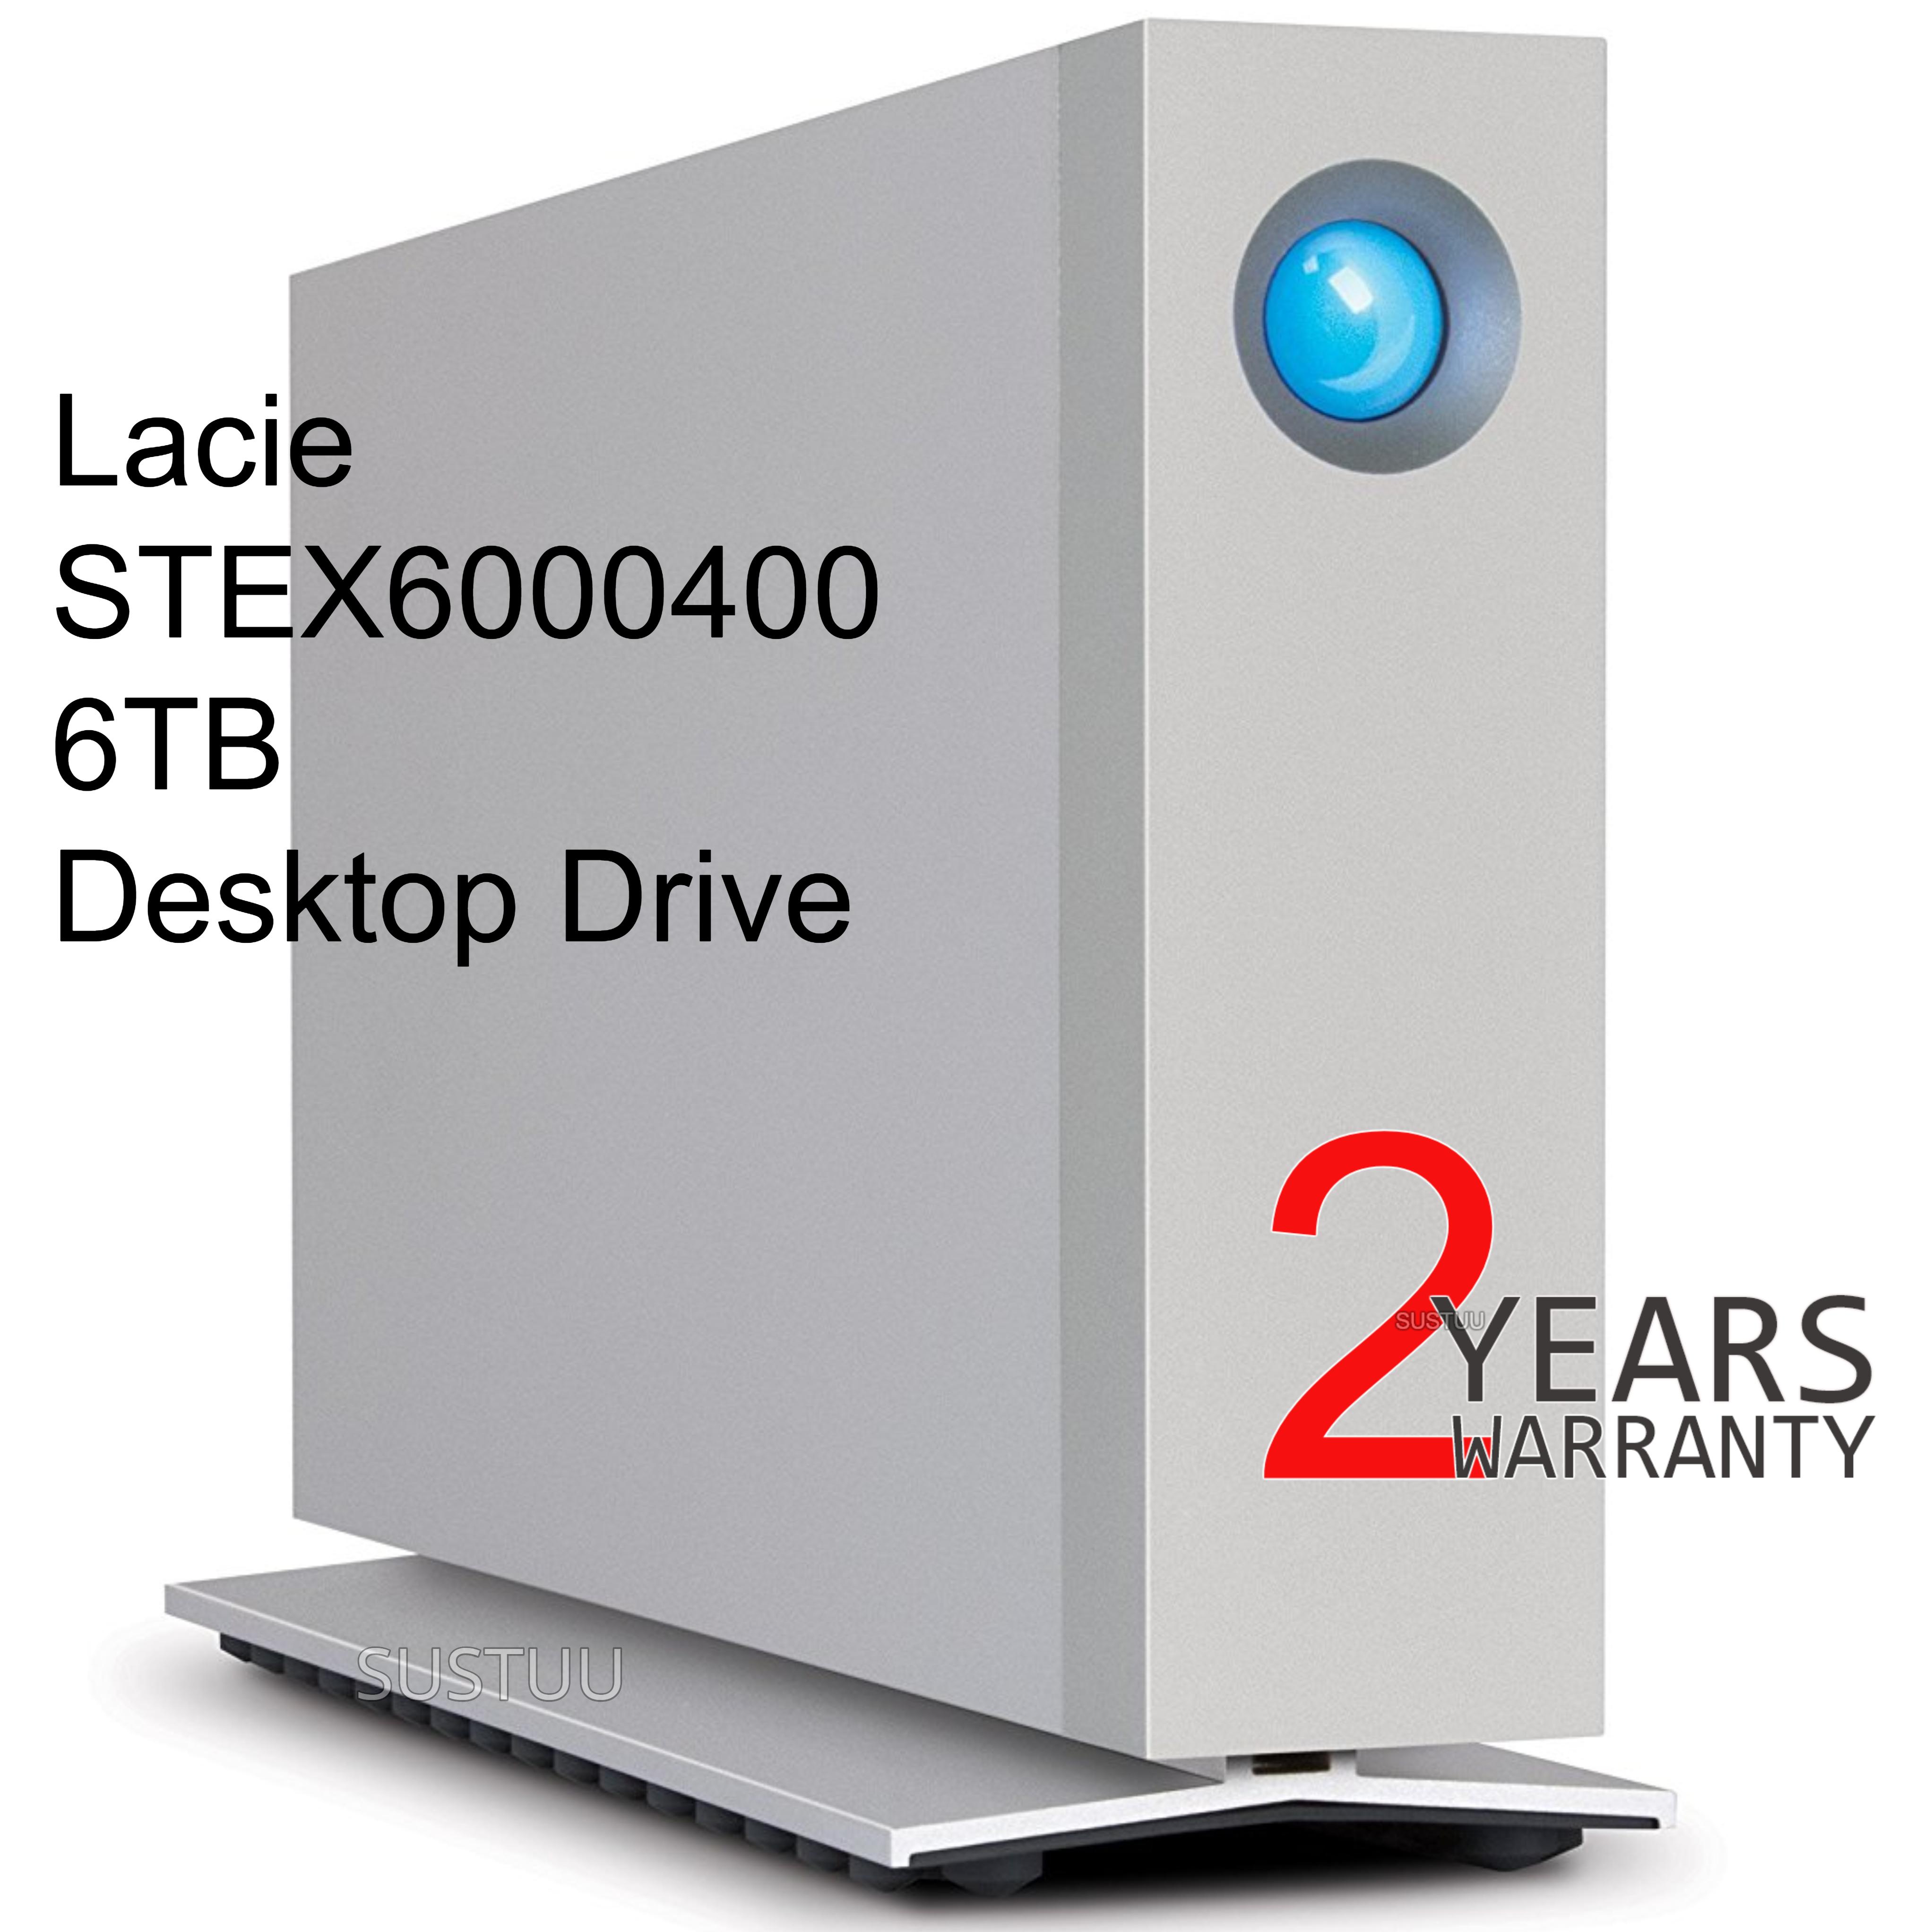 Lacie Desktop External Hard Drive | 6 TB | Dual Thunderbolt 2 & USB 3.0 | For PC & Mac